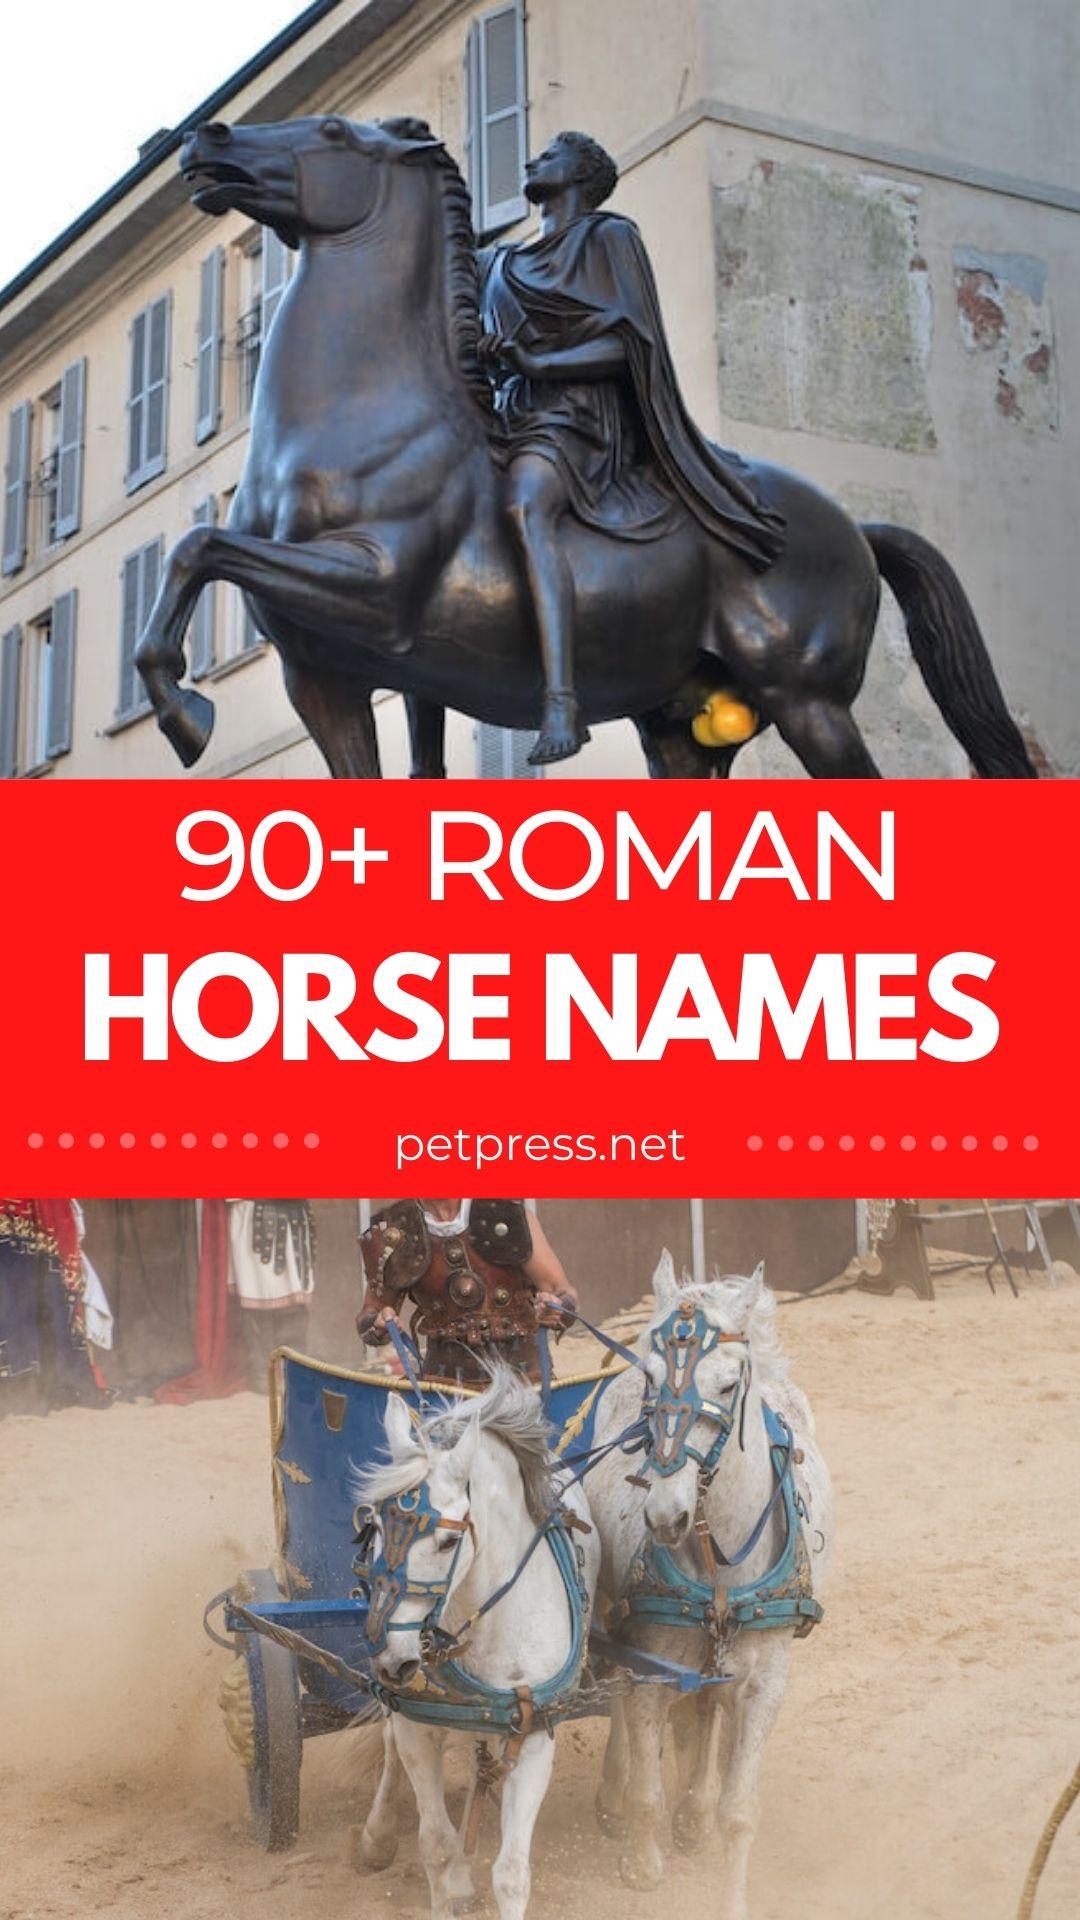 90+ roman horse names